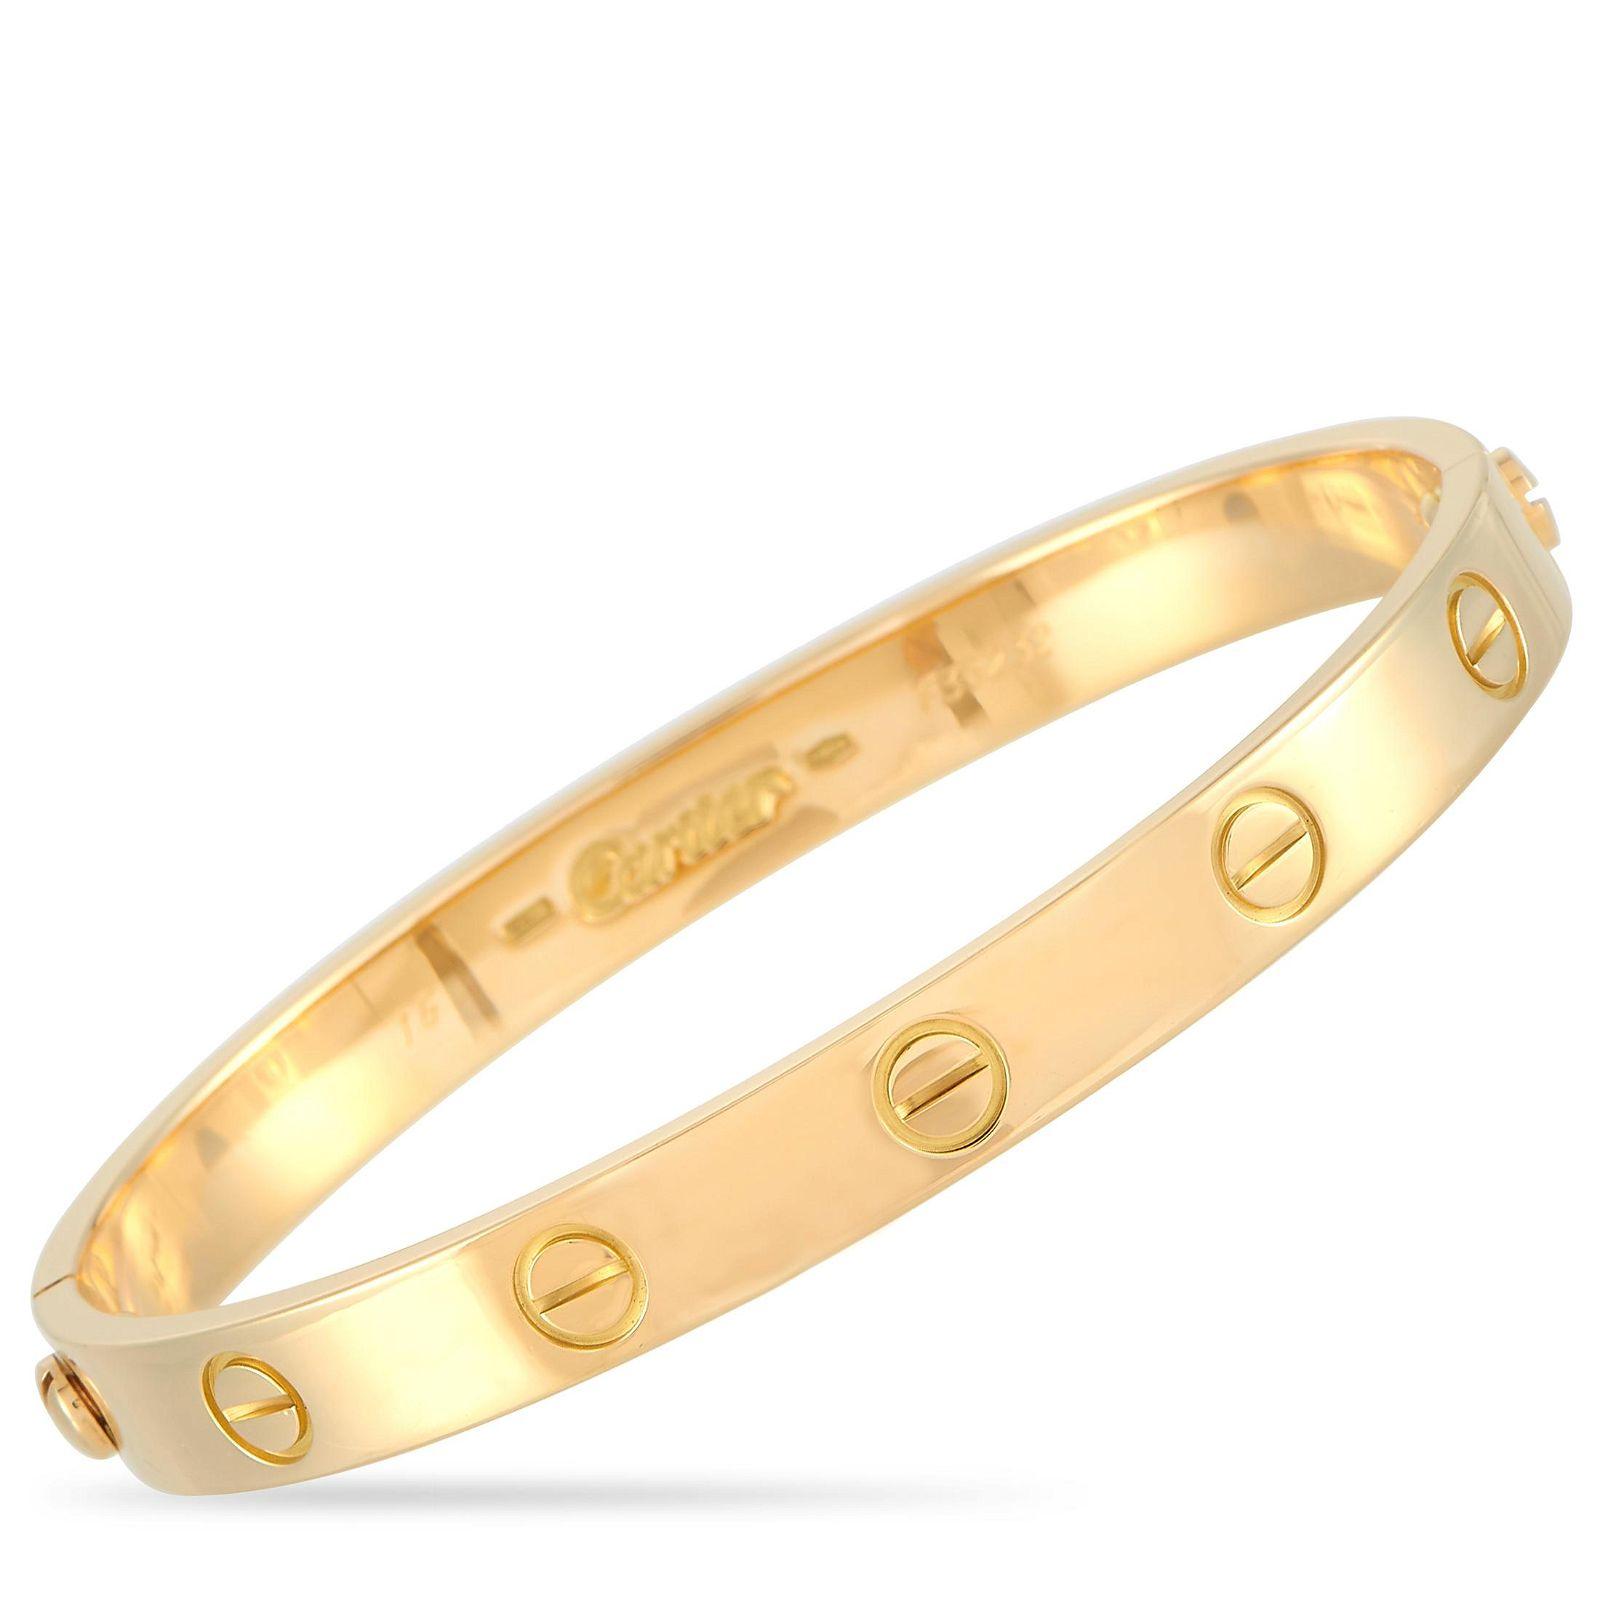 Cartier LOVE 18K YG Bracelet / Screwdriver Size 16